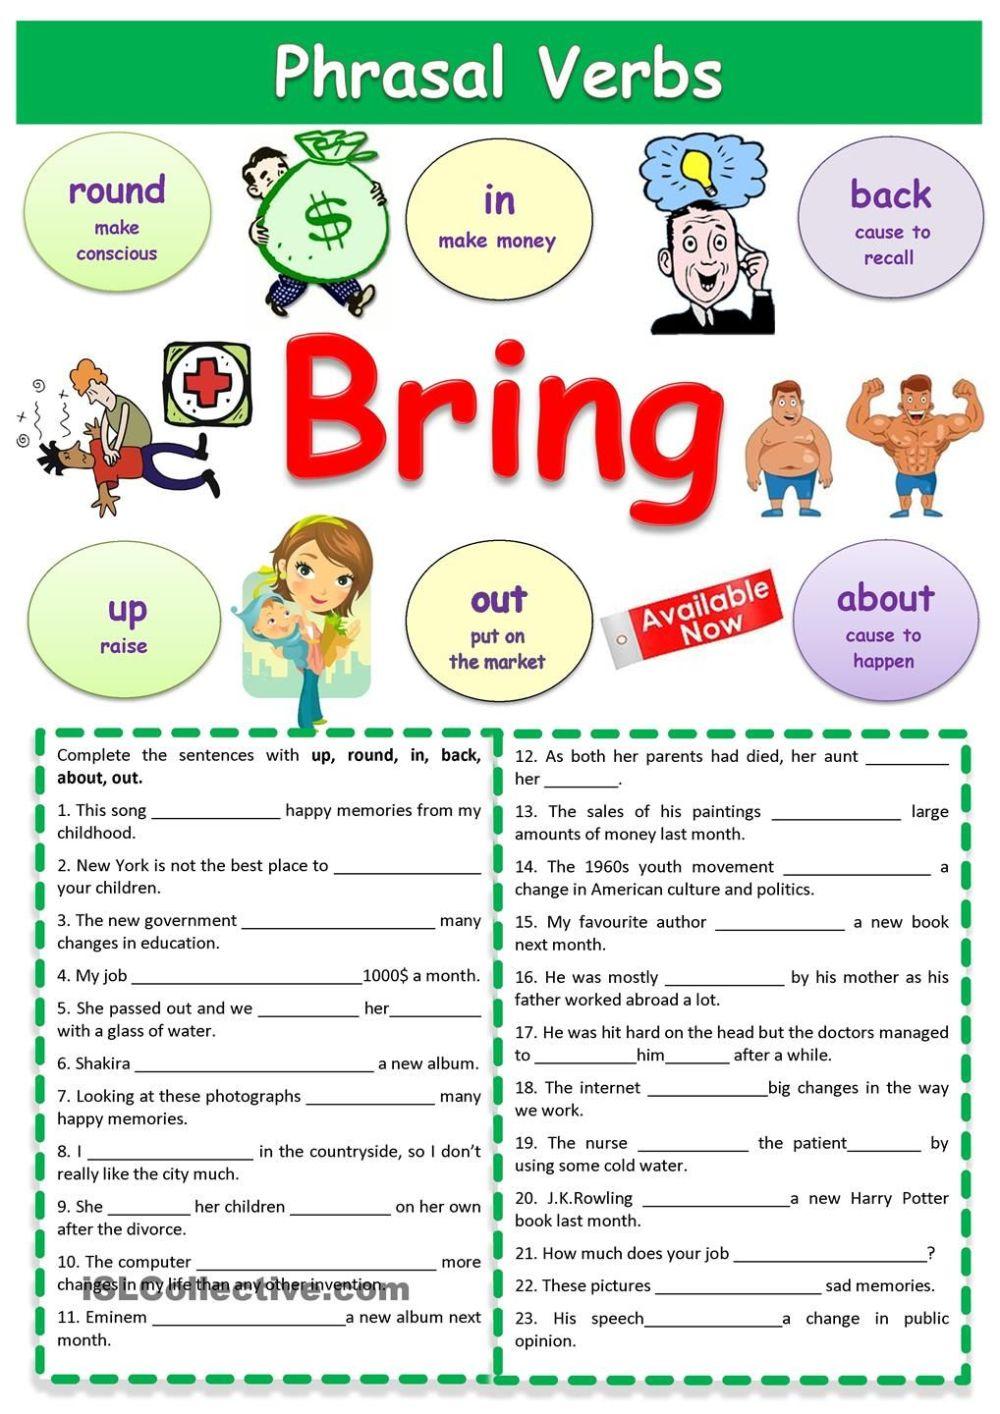 medium resolution of Phrasal Verbs Bring   English   Verb Worksheets